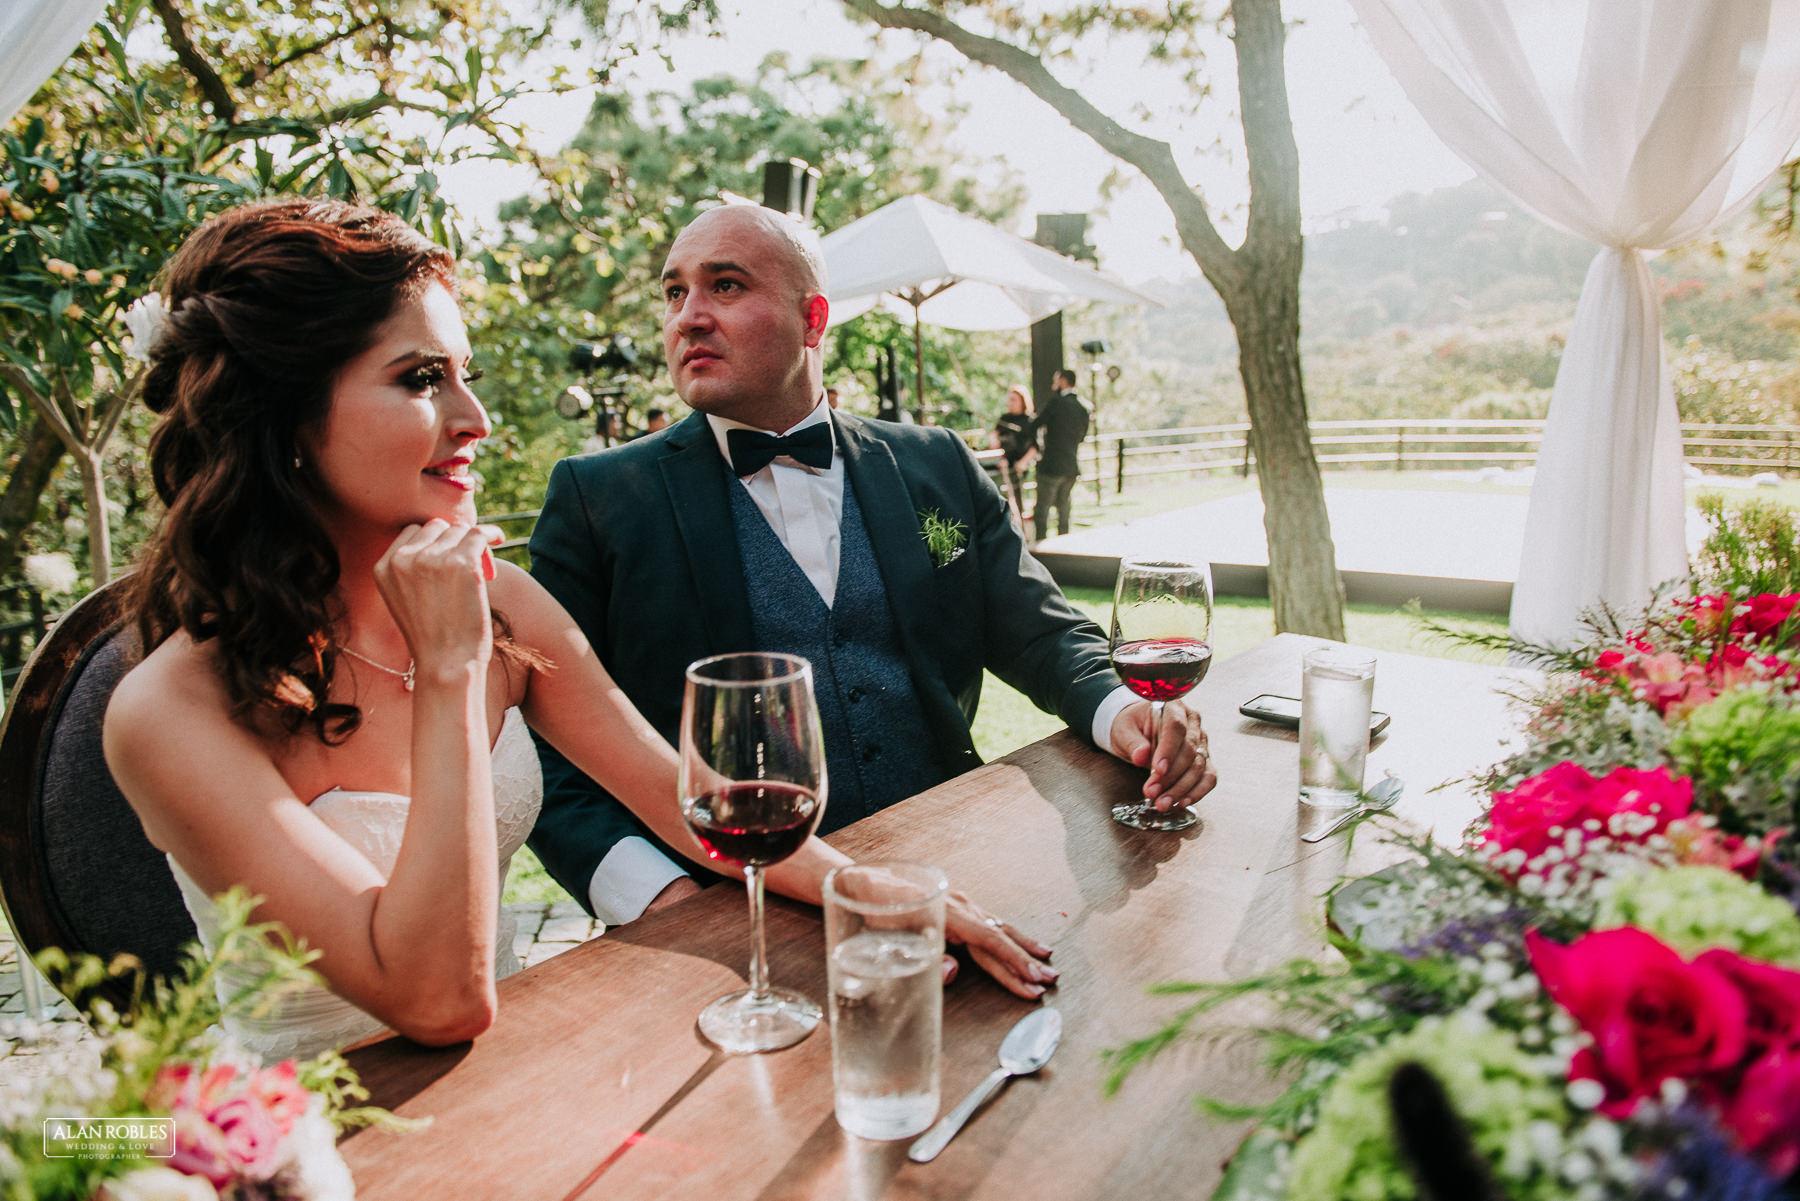 Fotografo de bodas guadalajara Alan Robles - Pinare terraza bistro 45